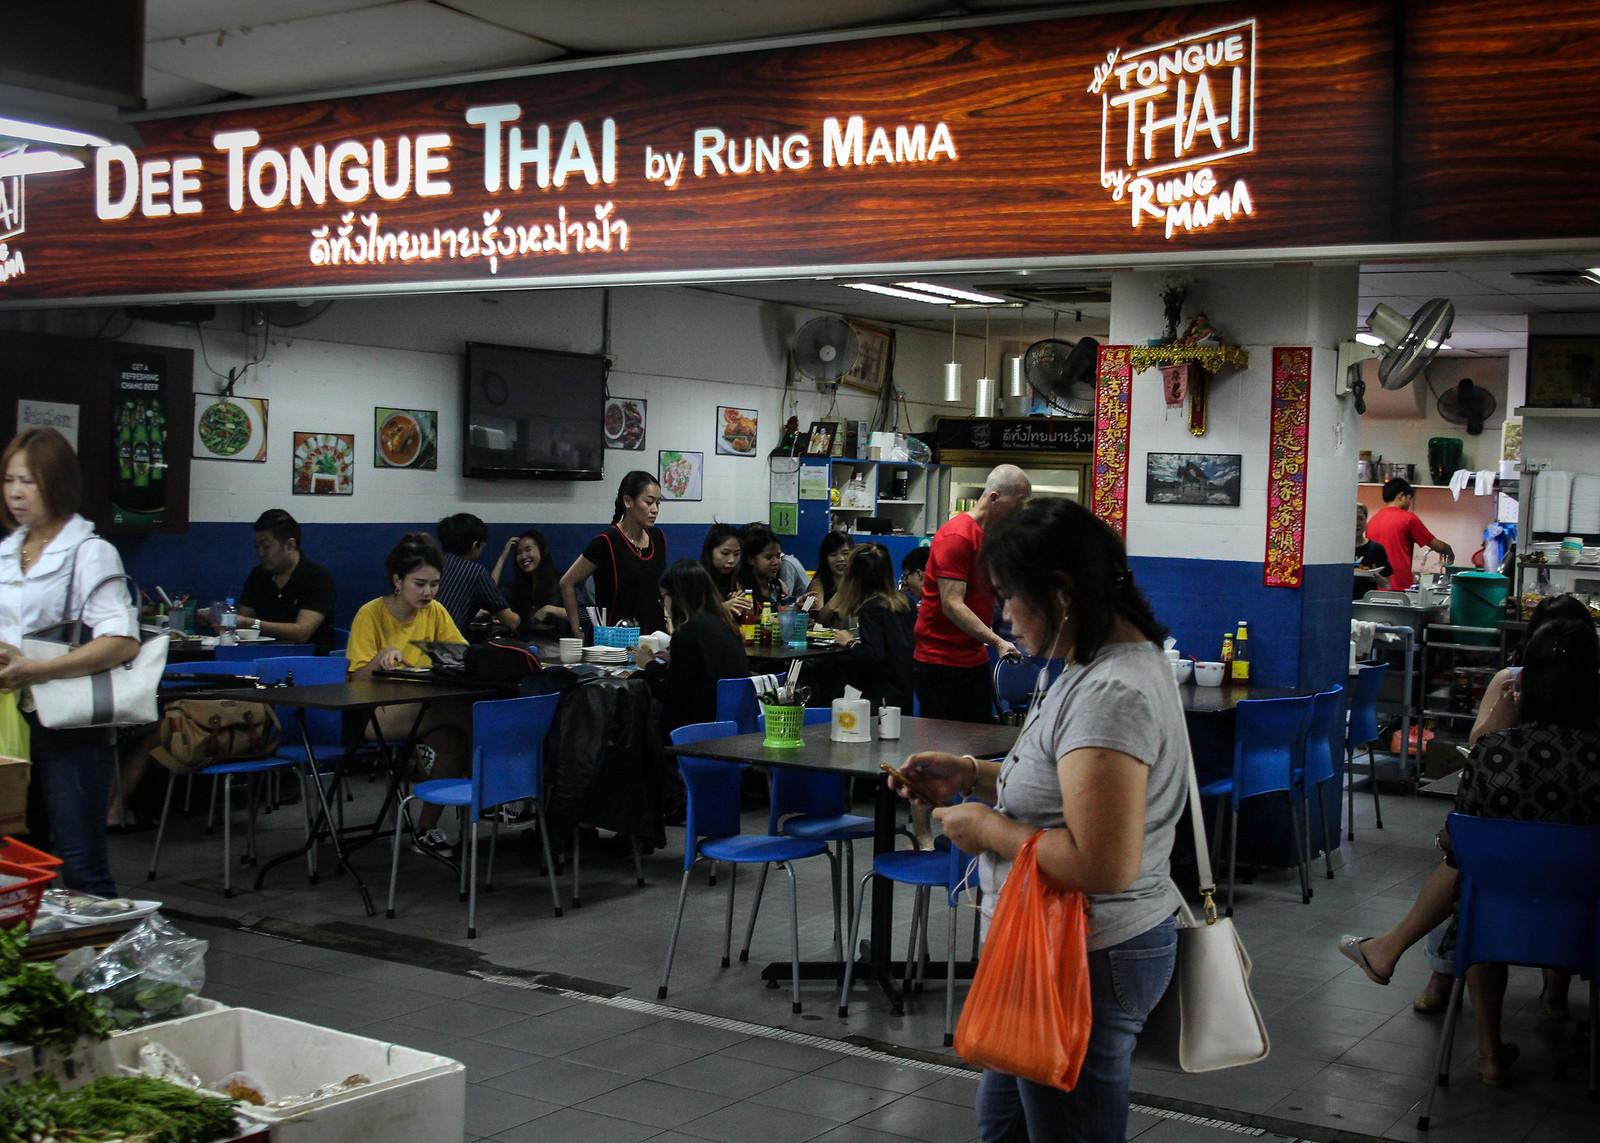 Dee ou Tong ou Thai ou摊档